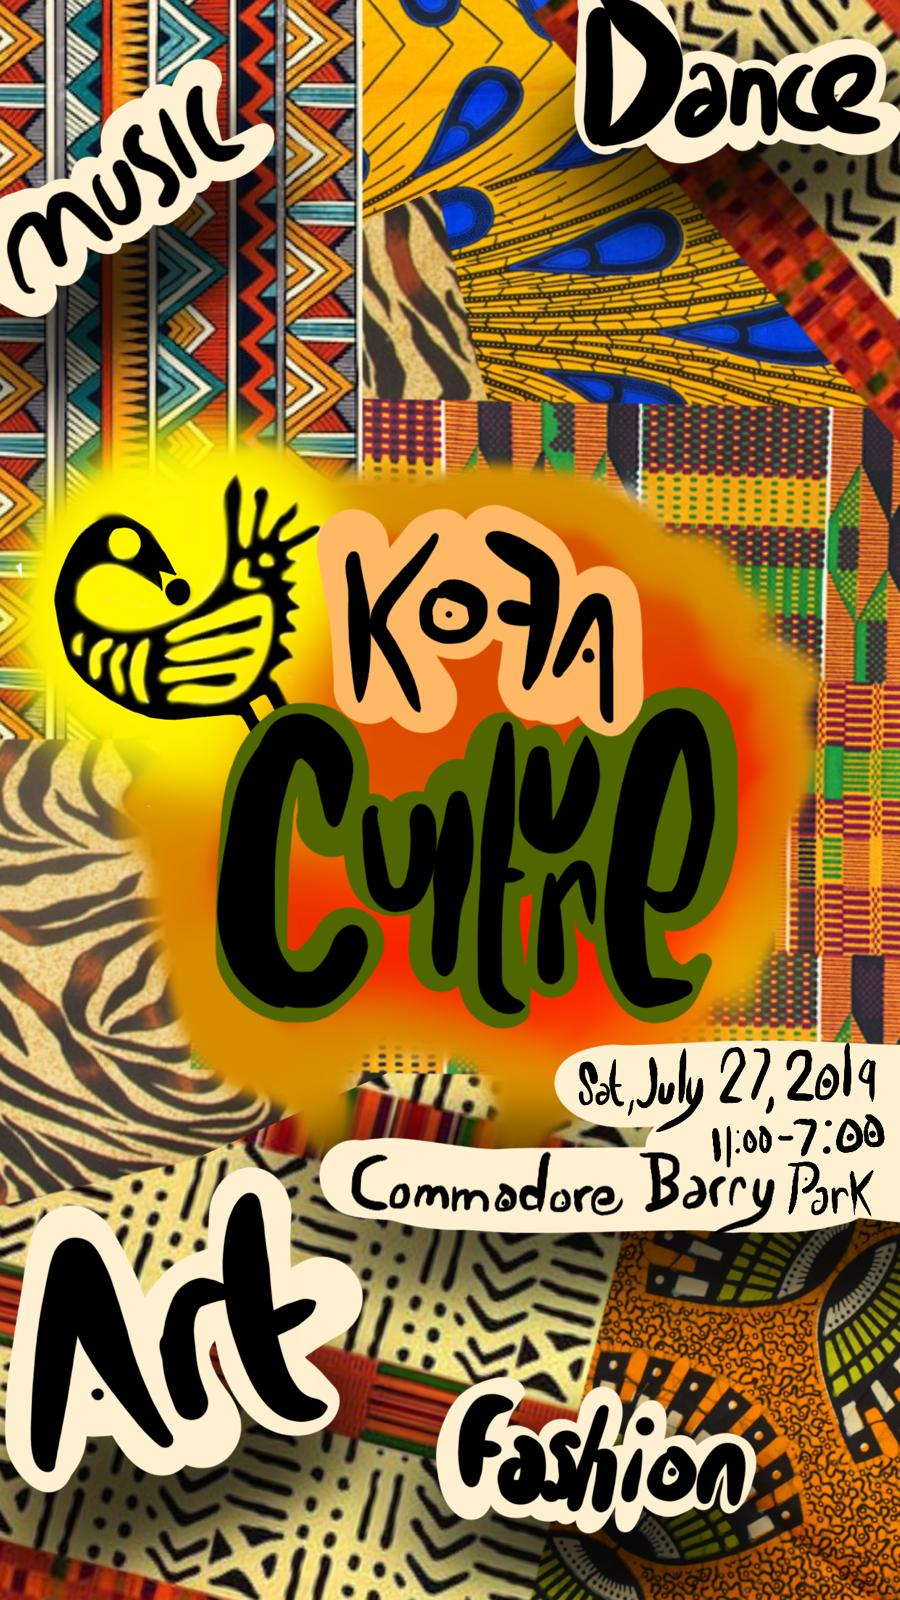 Sankofa Culture and Arts Festival.jpg